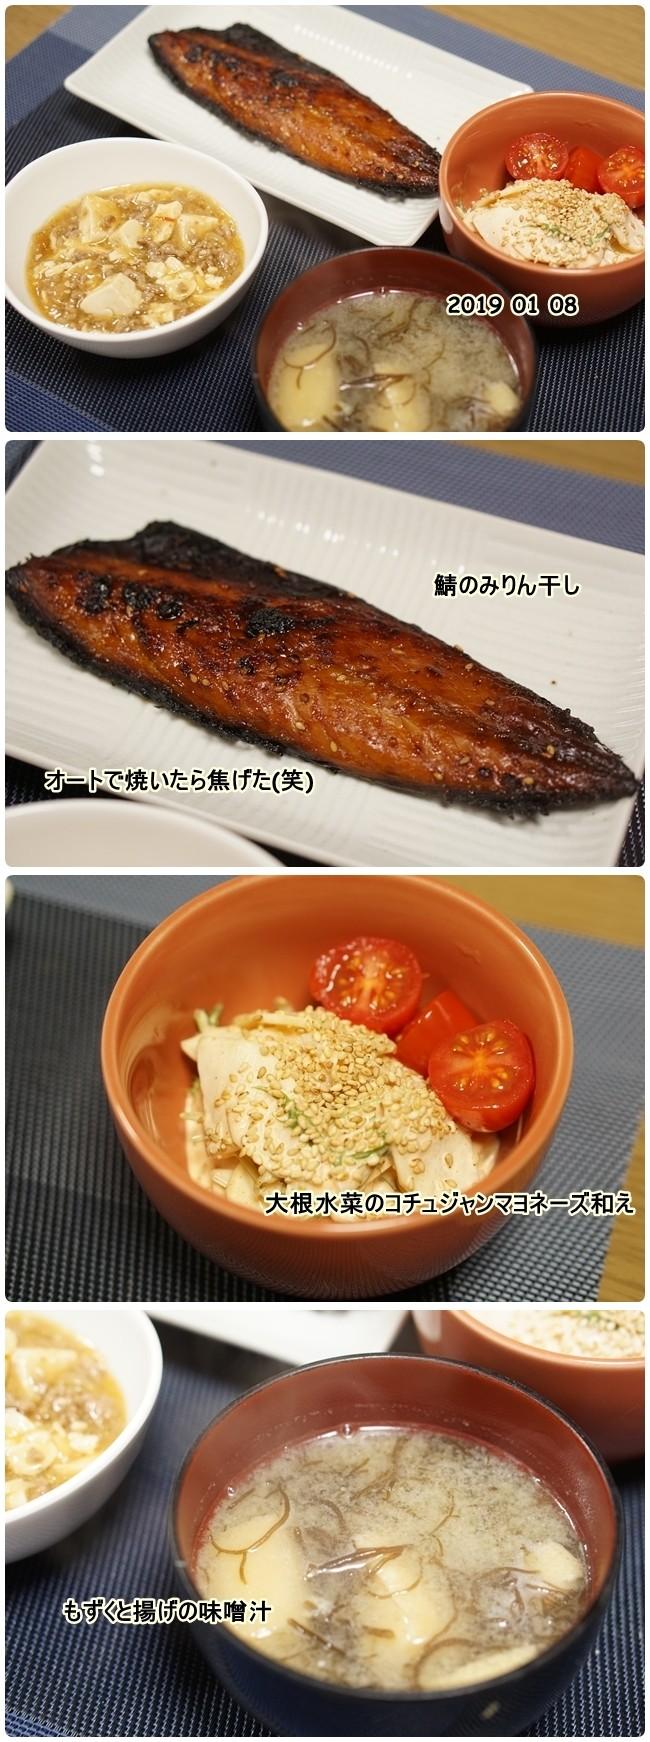 ■DSC01912-vert